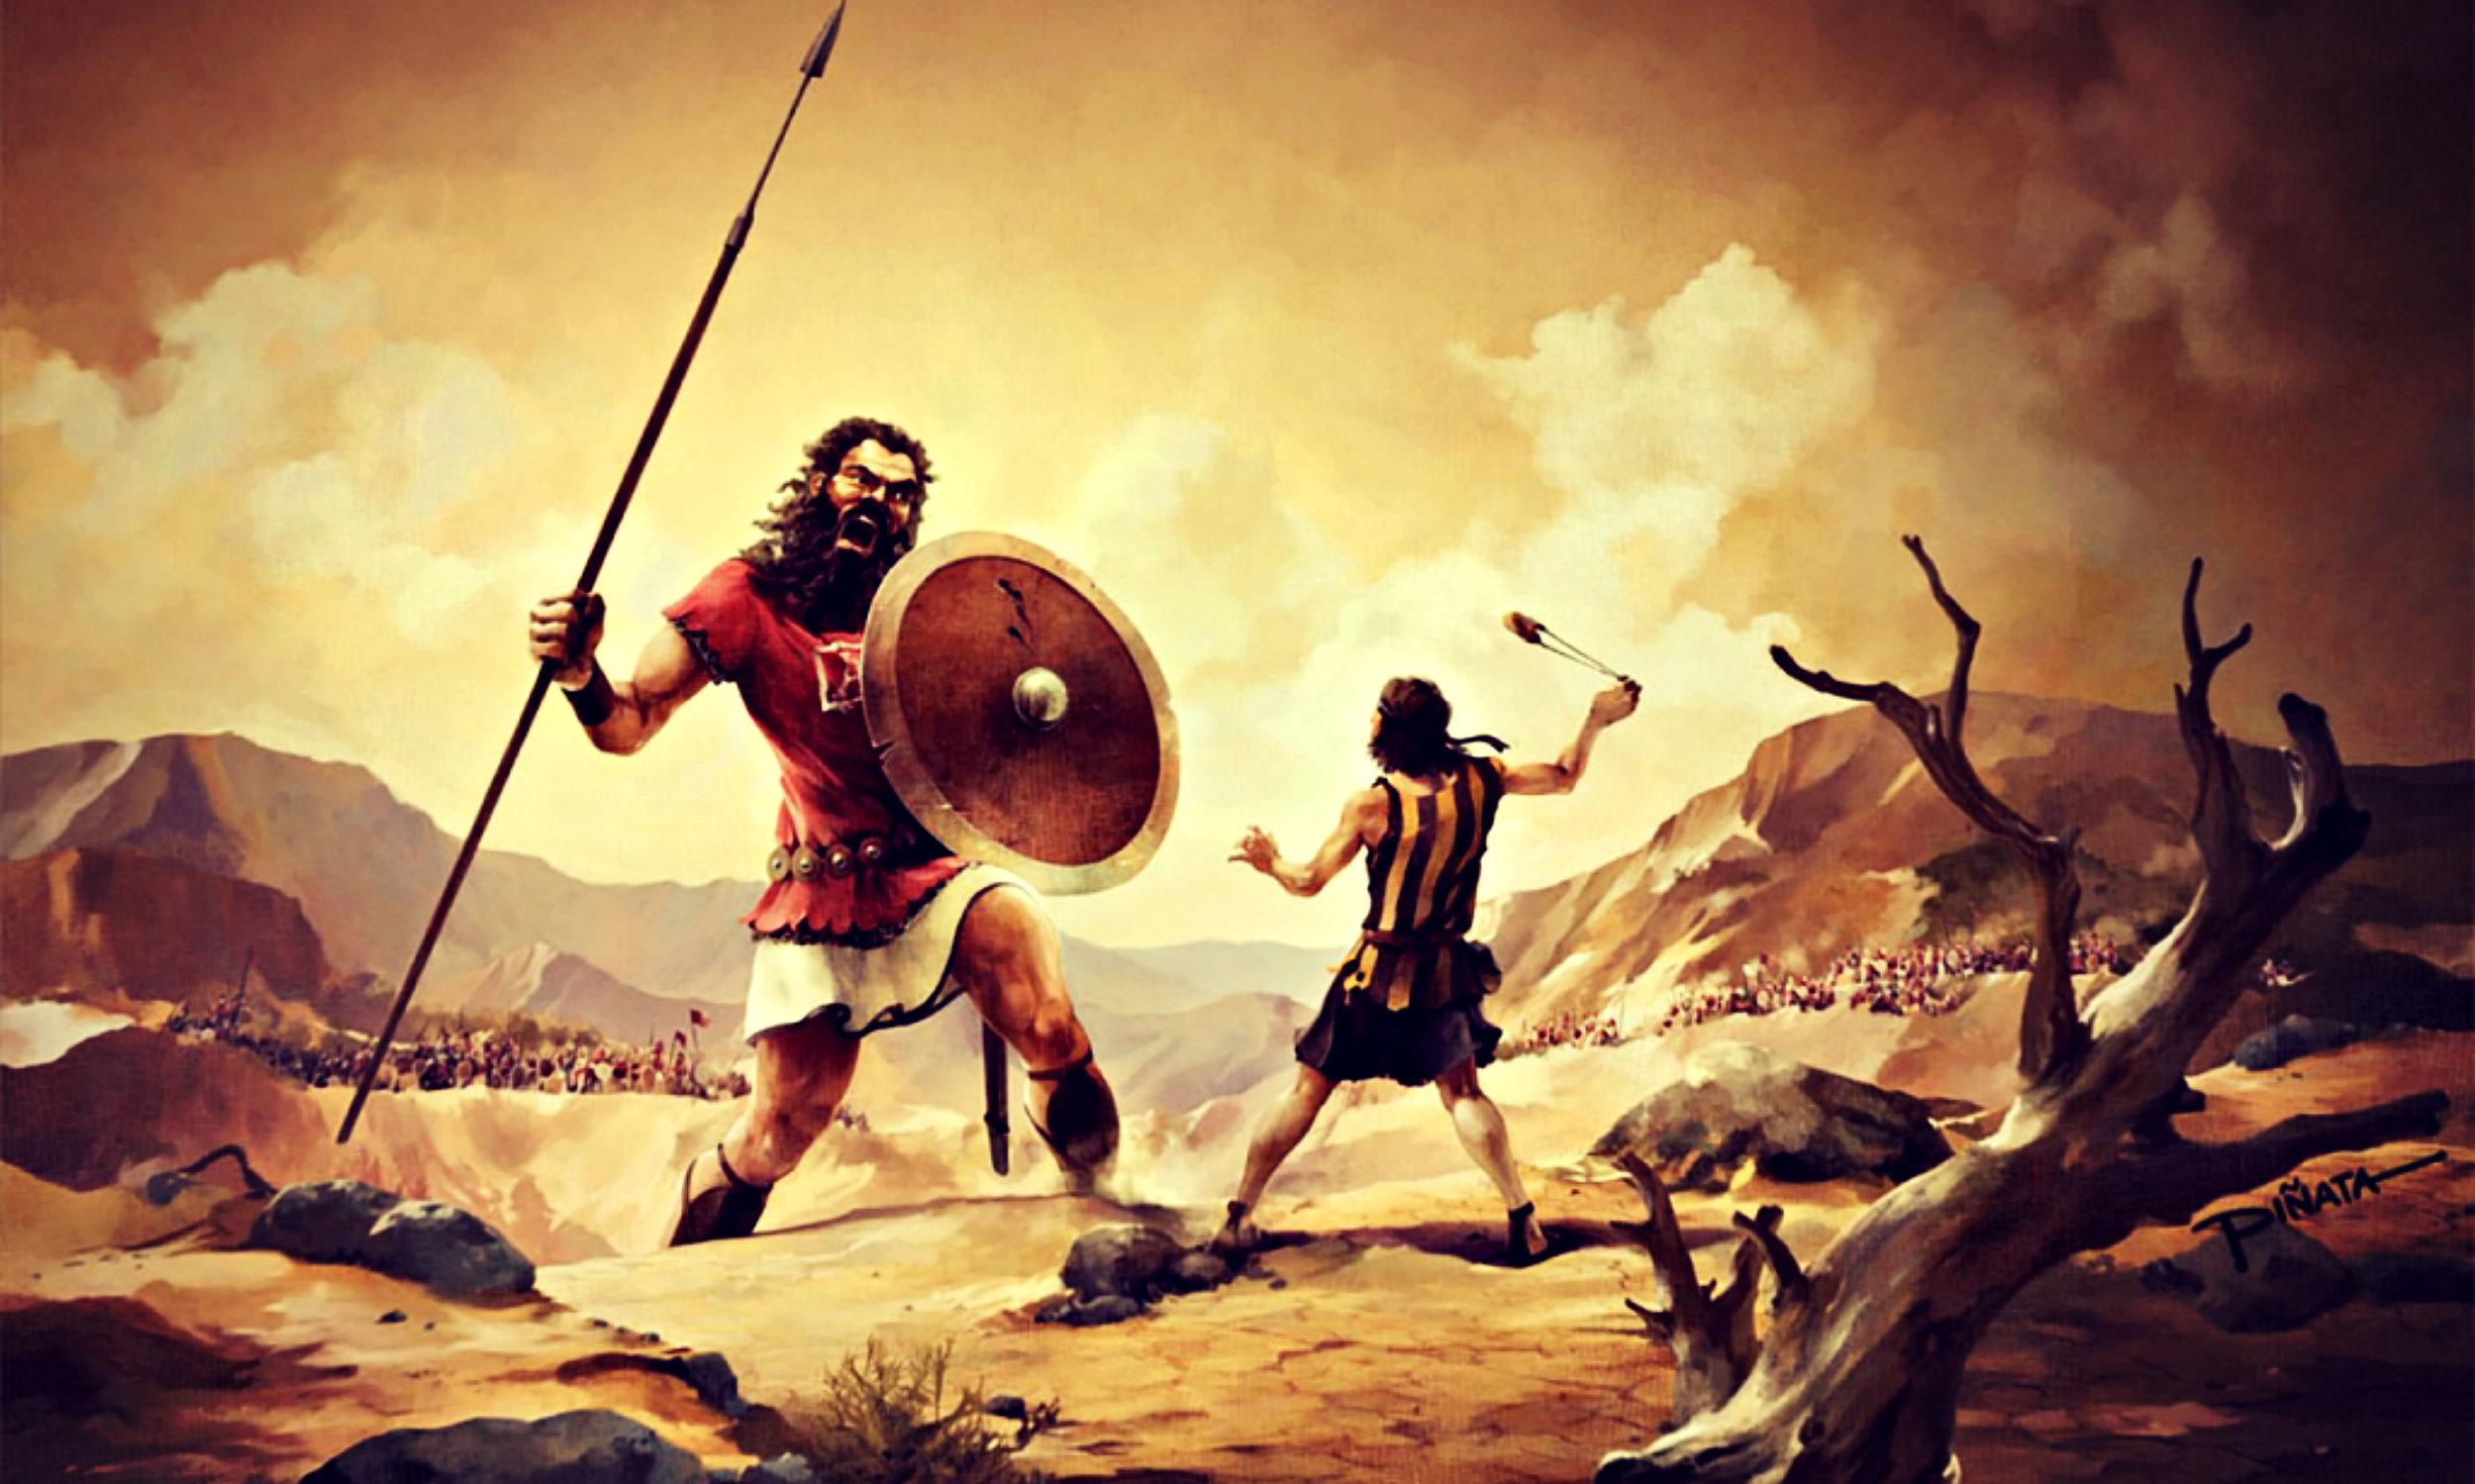 David-v-Goliath-1024x614.jpg